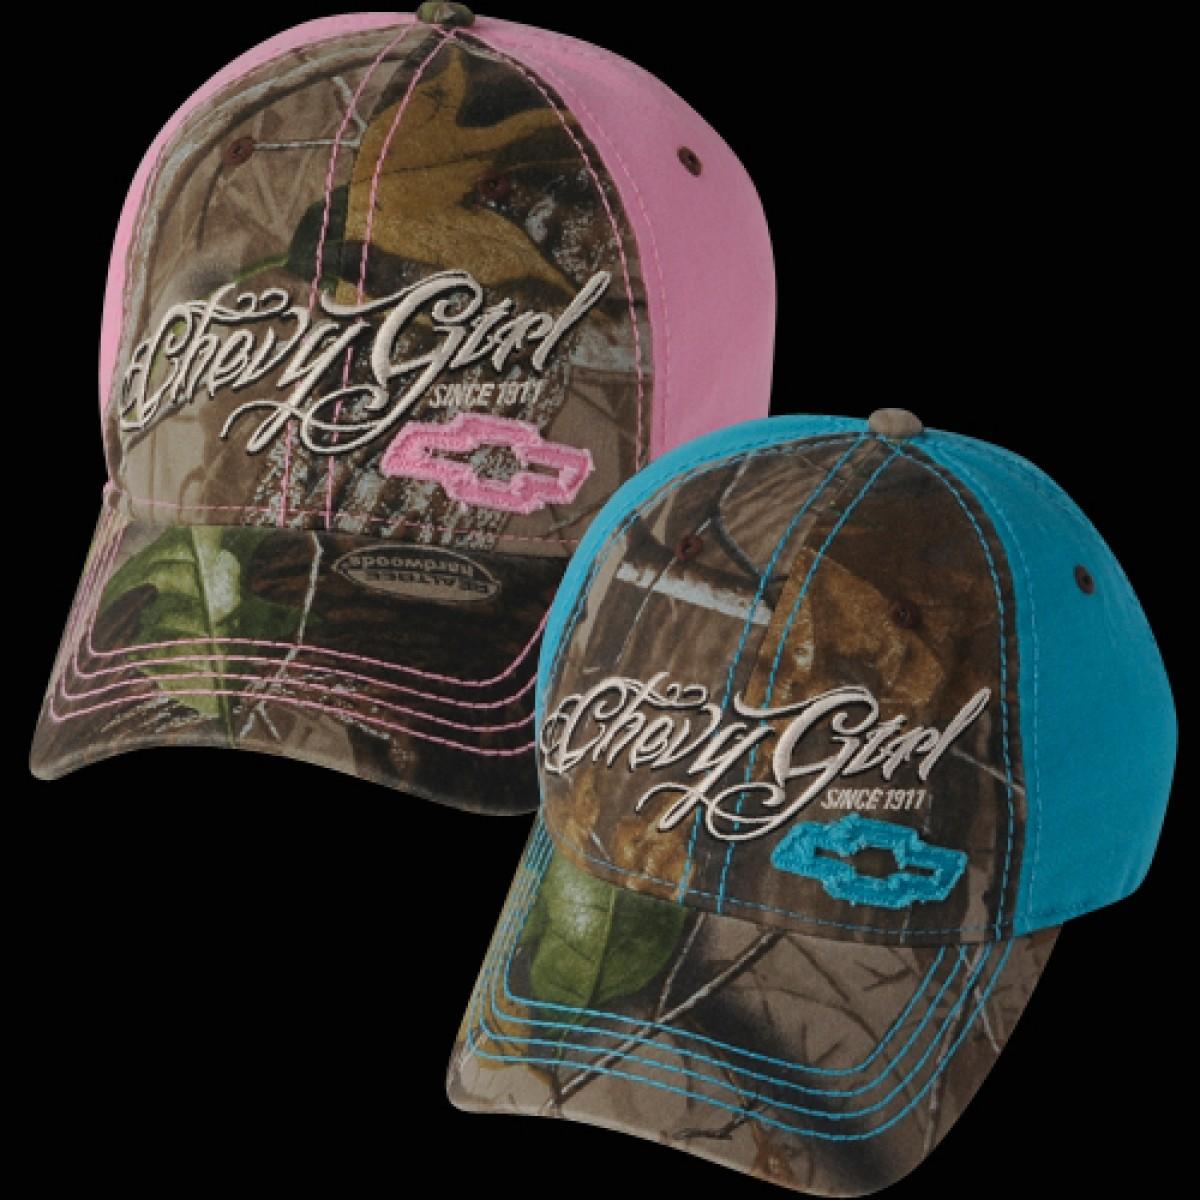 HossRods.| Chevy Girl Camo Hat | Hot Rod Accessories, Garage